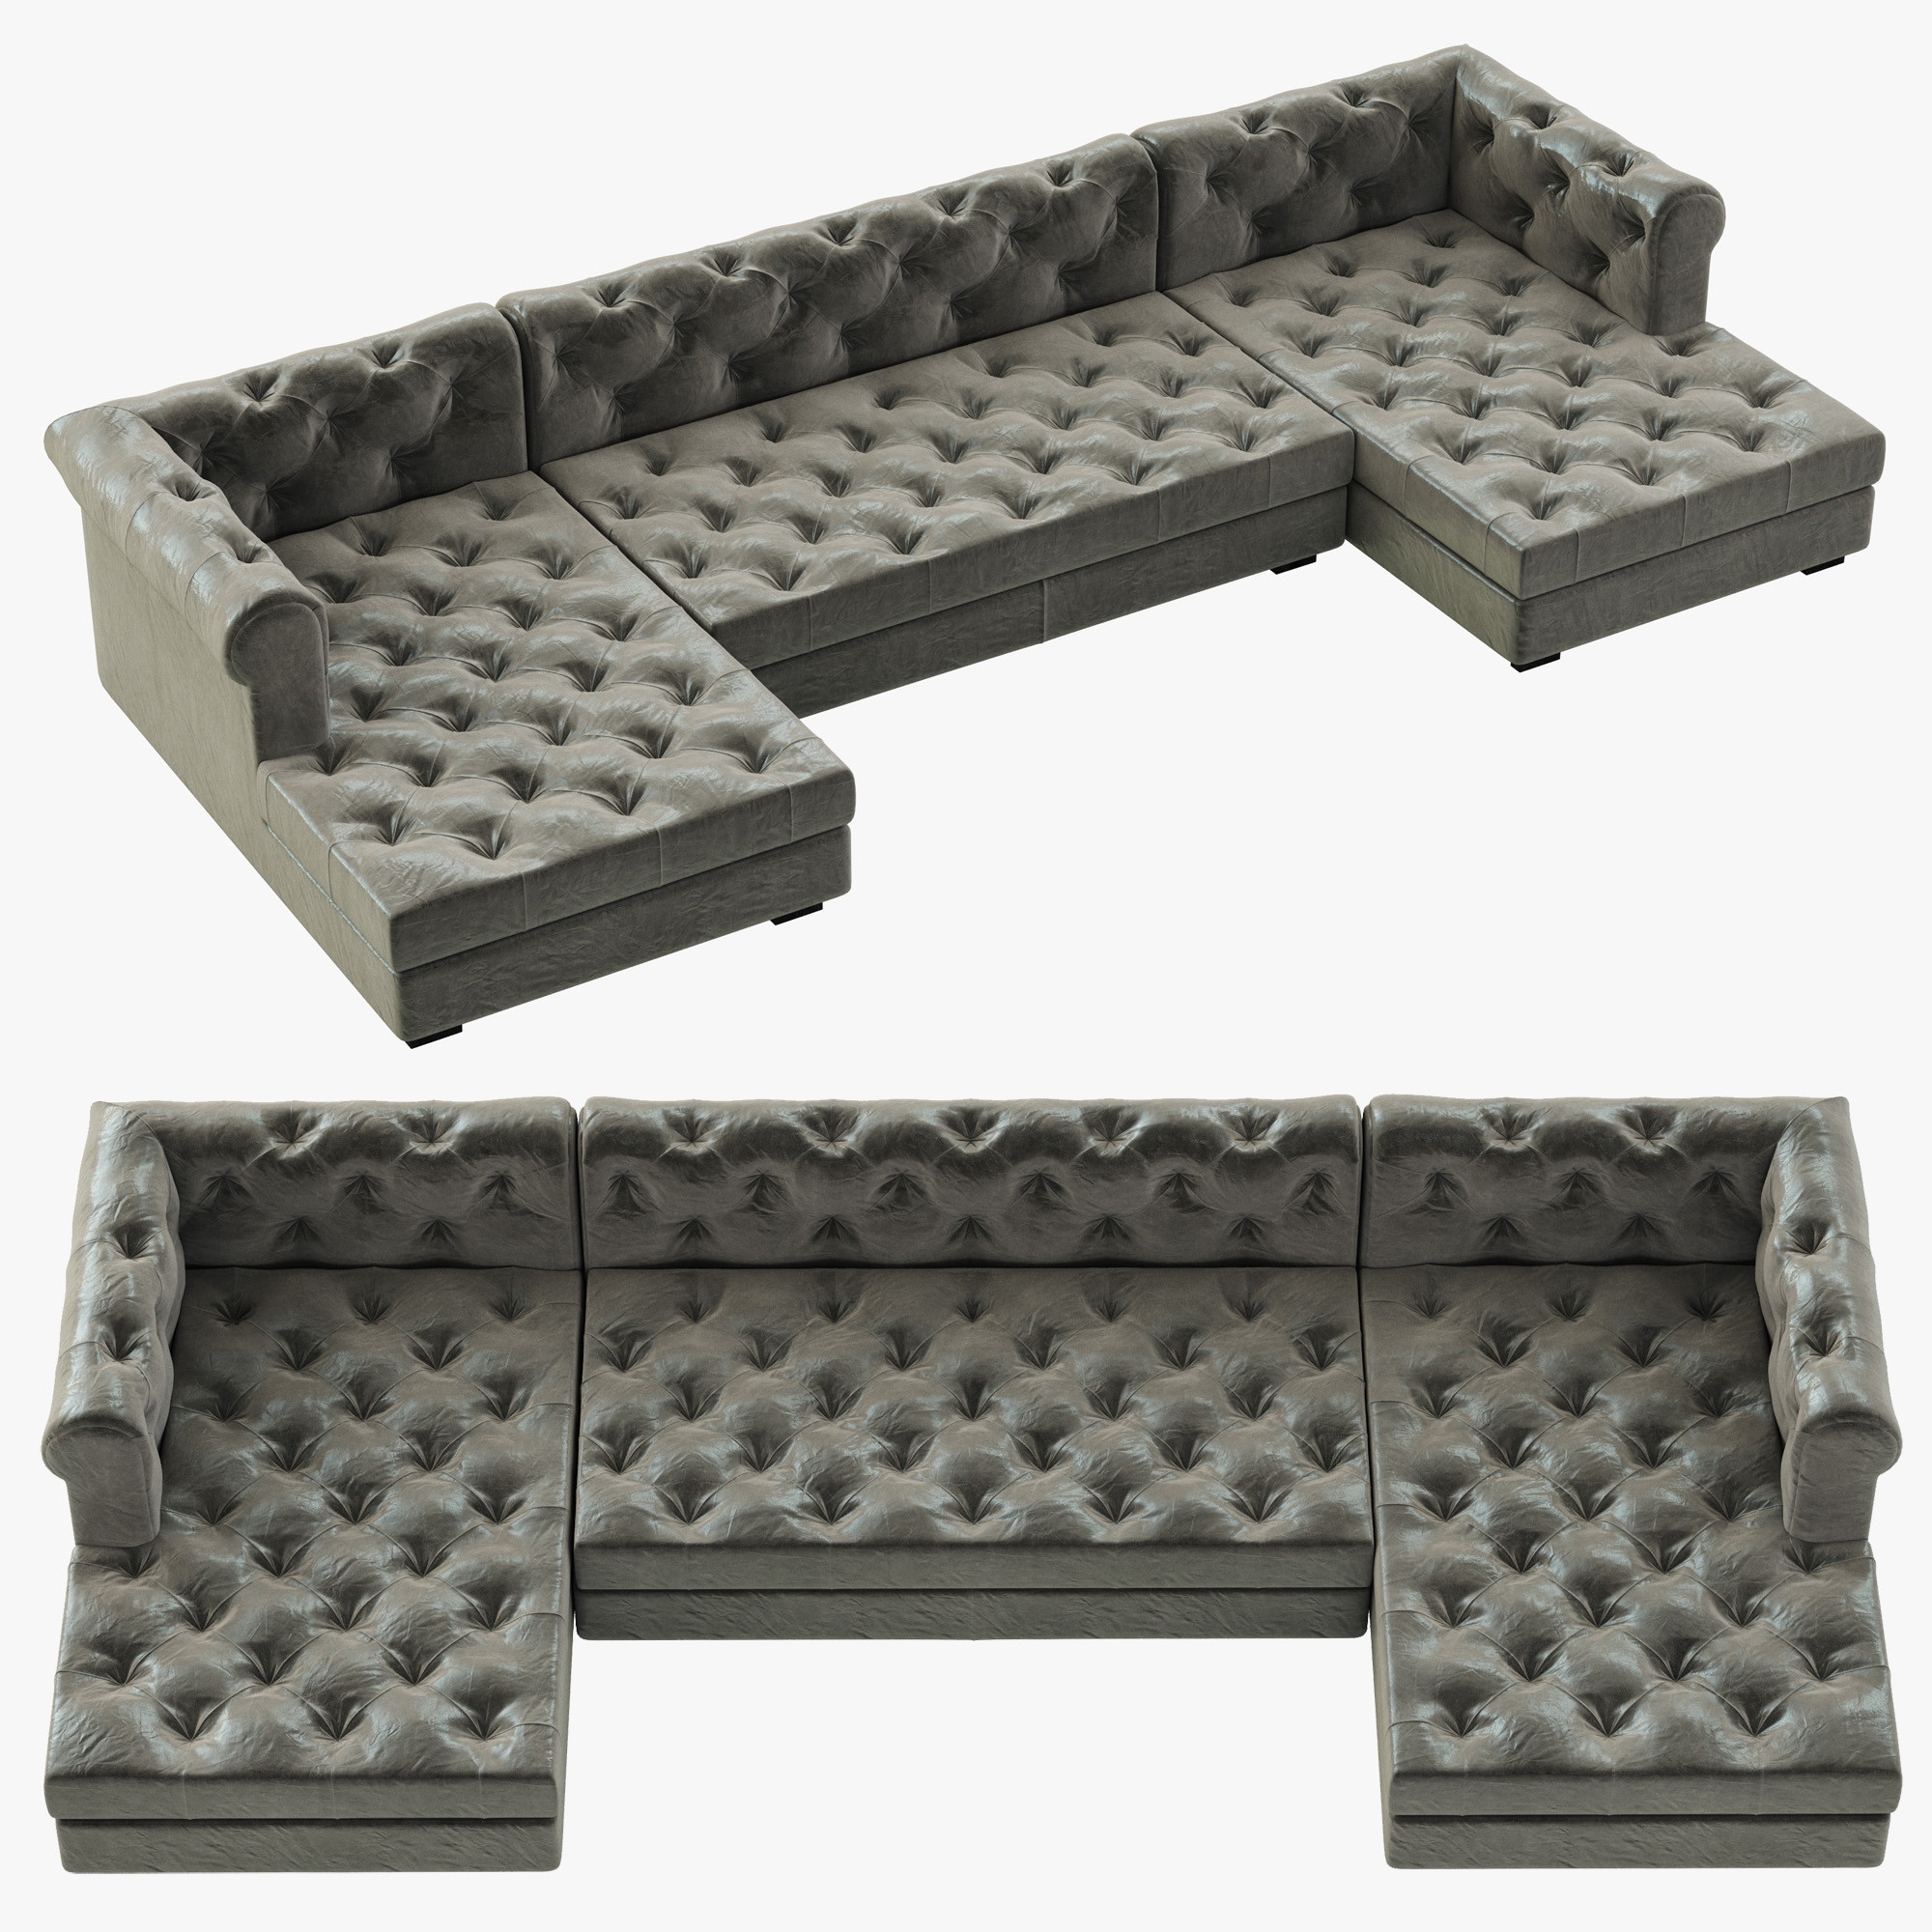 rh modern modena chesterfield 3d model. Black Bedroom Furniture Sets. Home Design Ideas